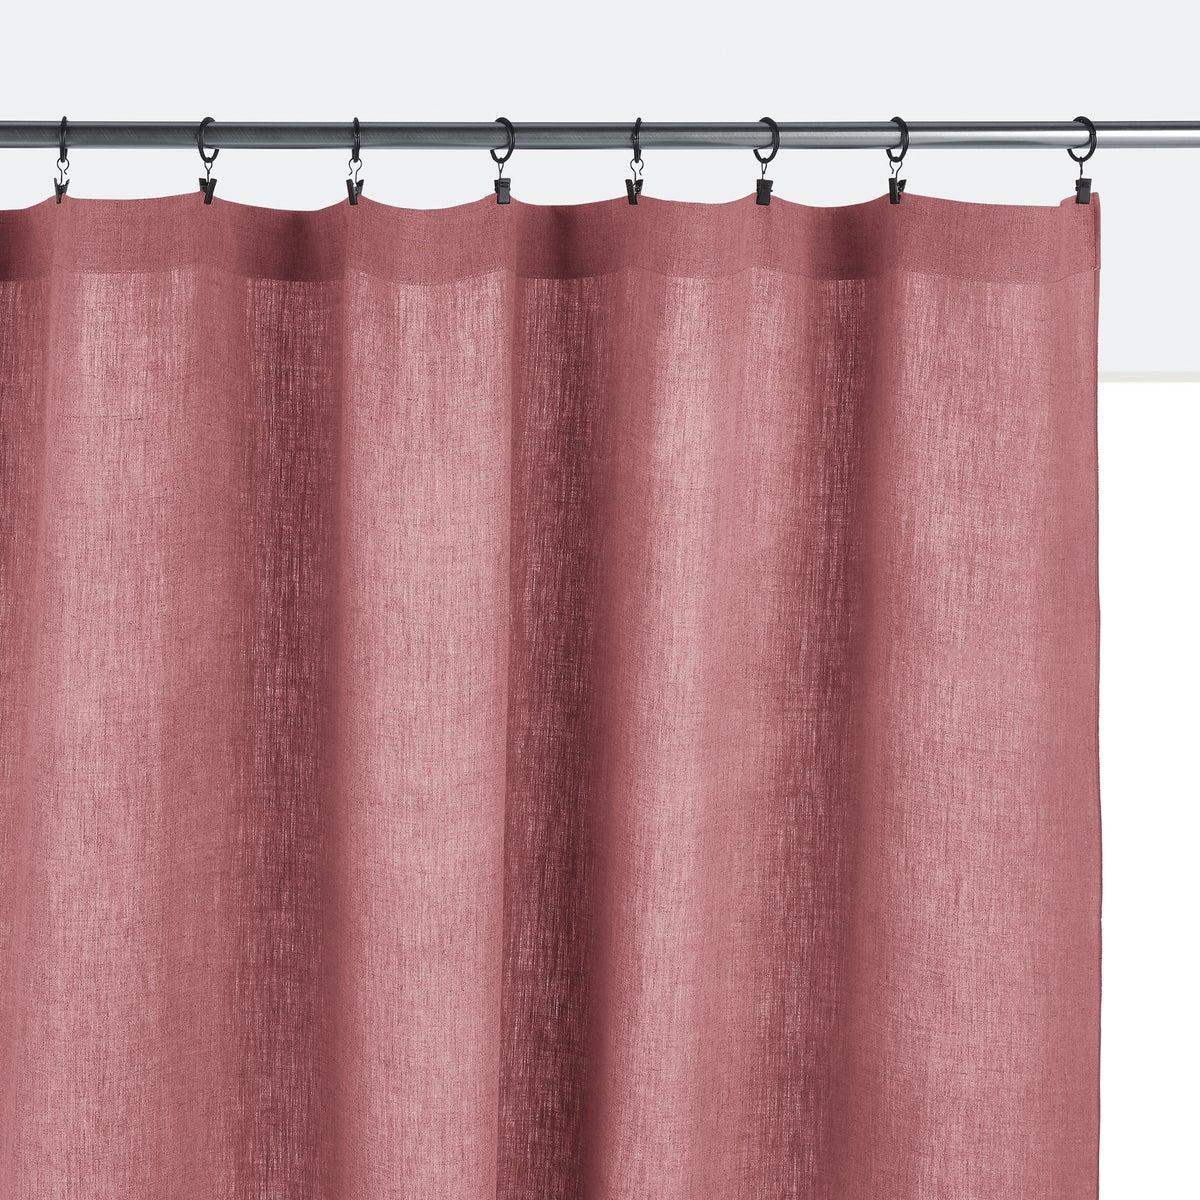 Cortina de lino lavado, Onega